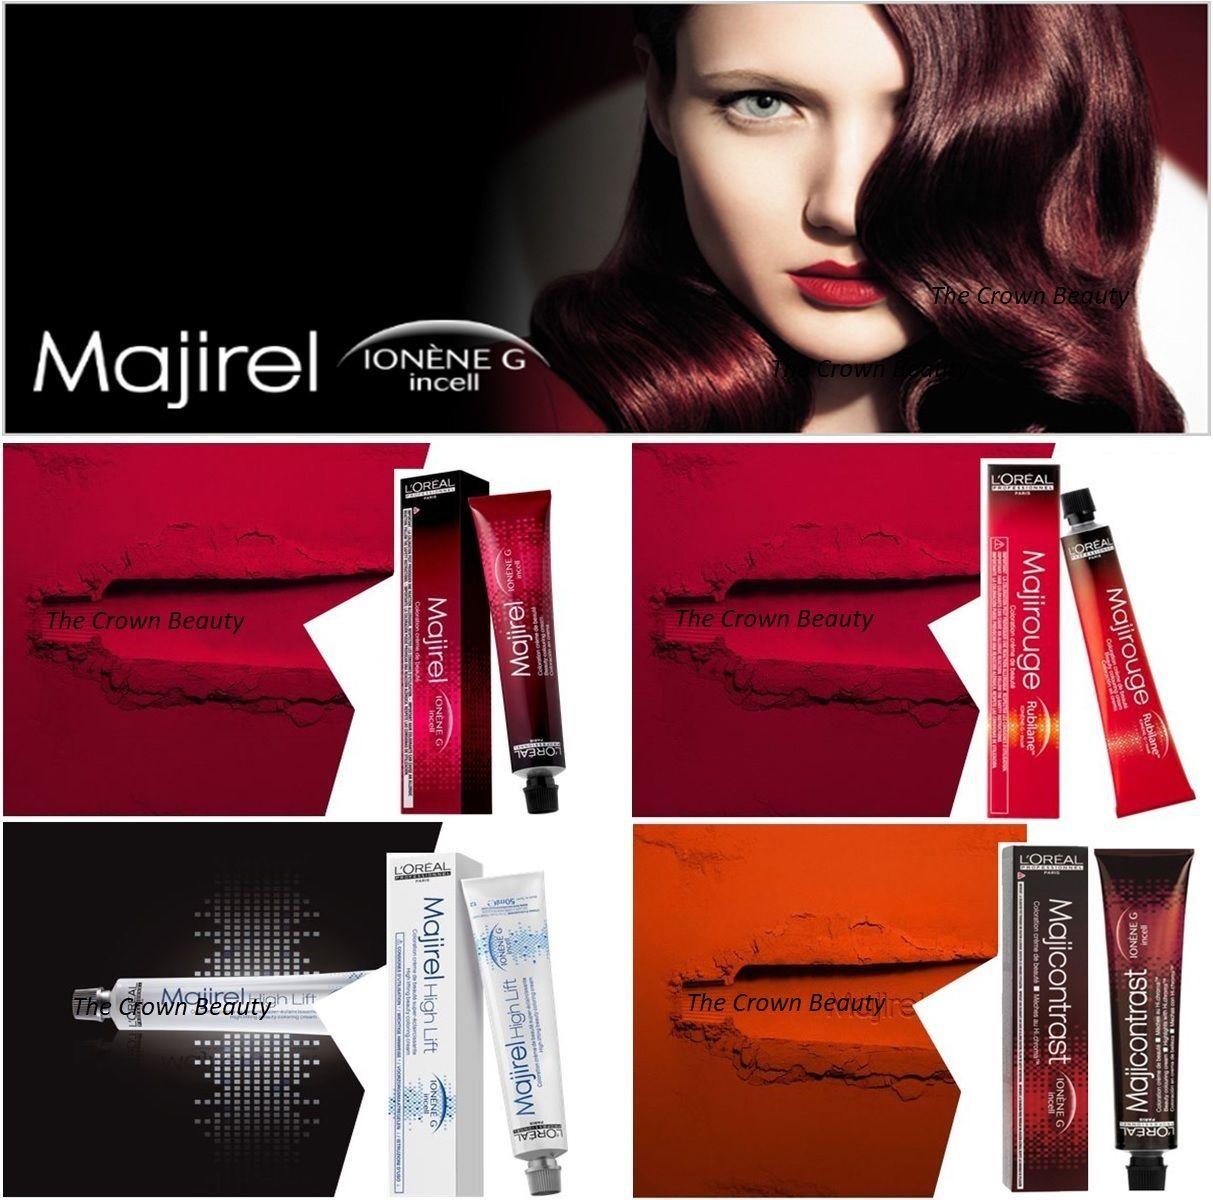 Loreal Majirel Majirouge Majicontrast High Lift Permanent